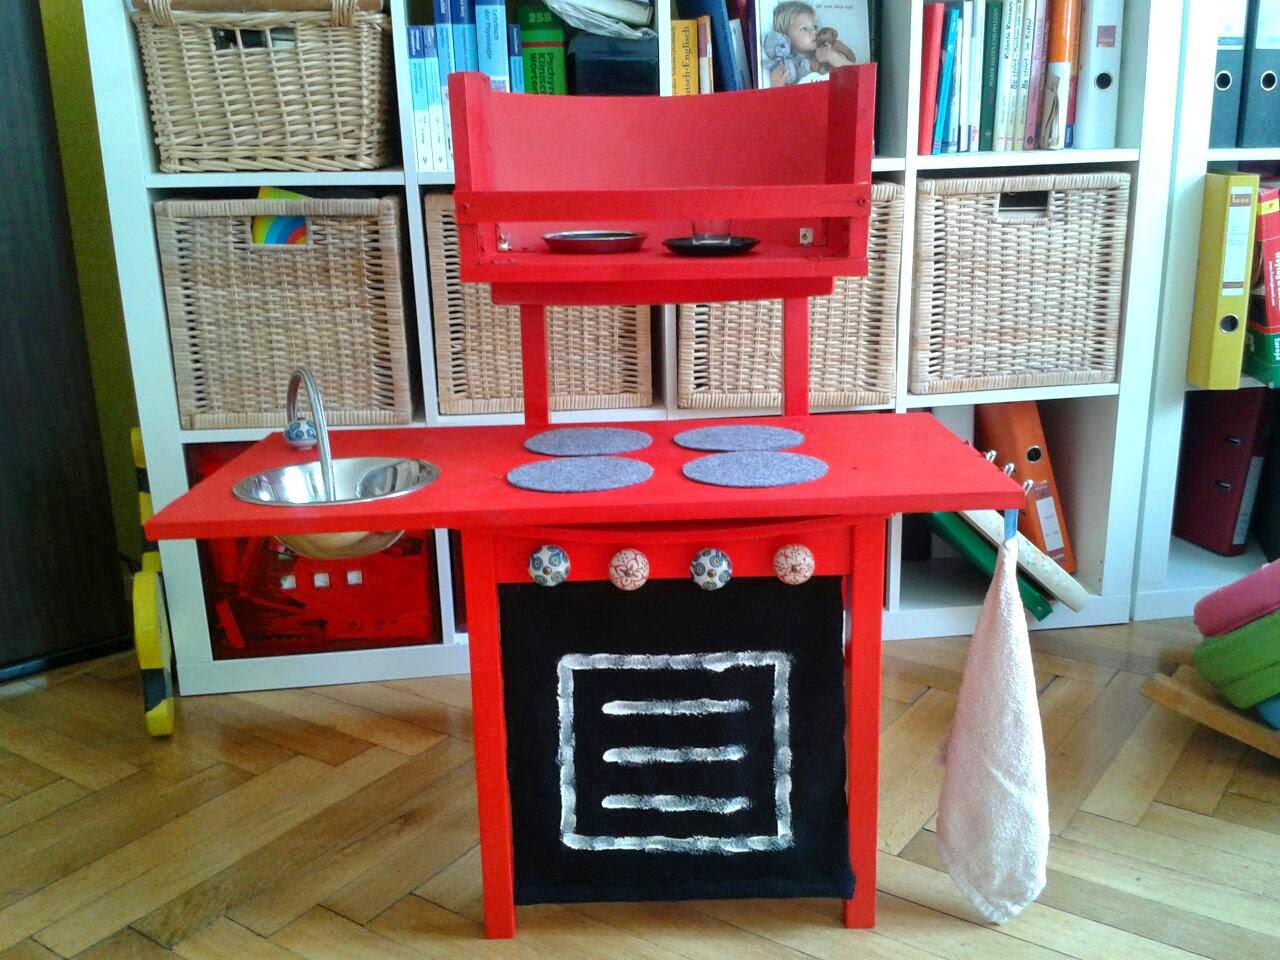 http://blog.donkrawallo.at/2014/08/little-smutjes-upcycling-pantry.html